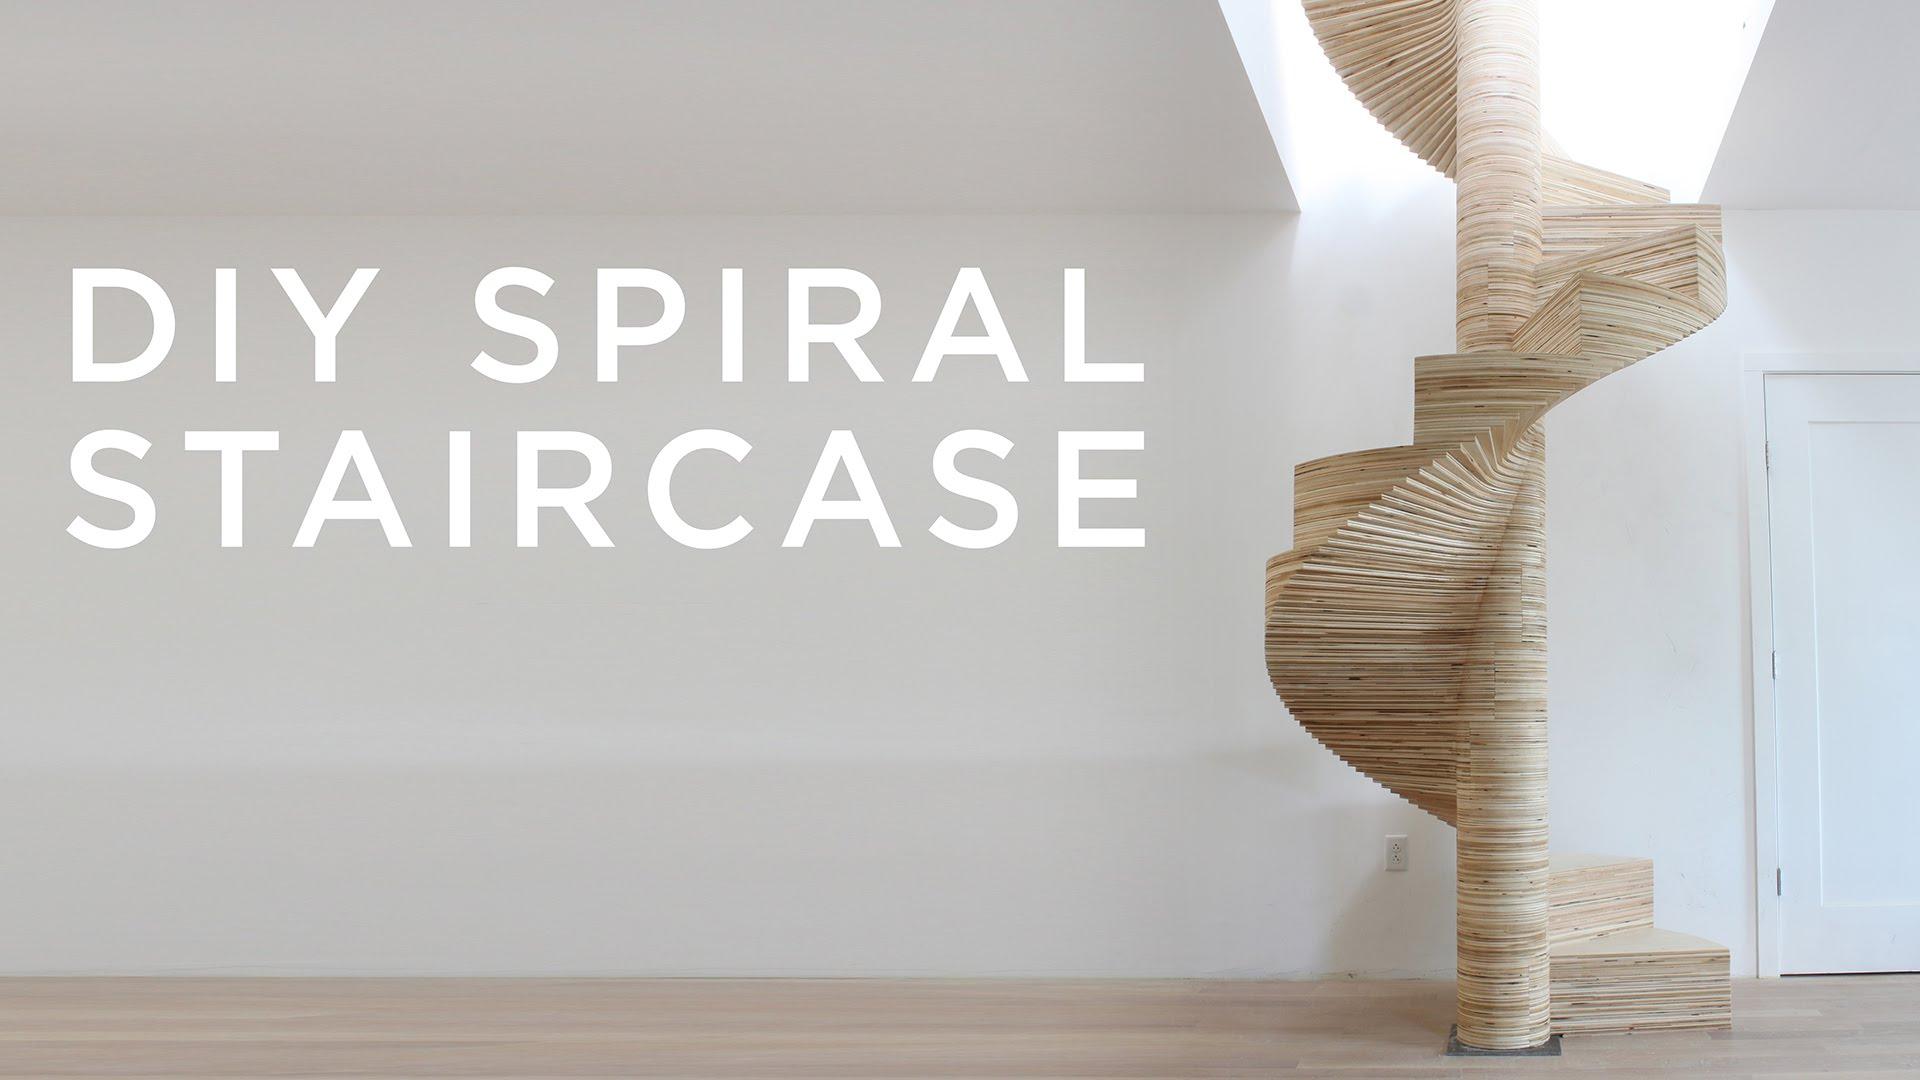 Building a DIY CNC-cut spiral staircase